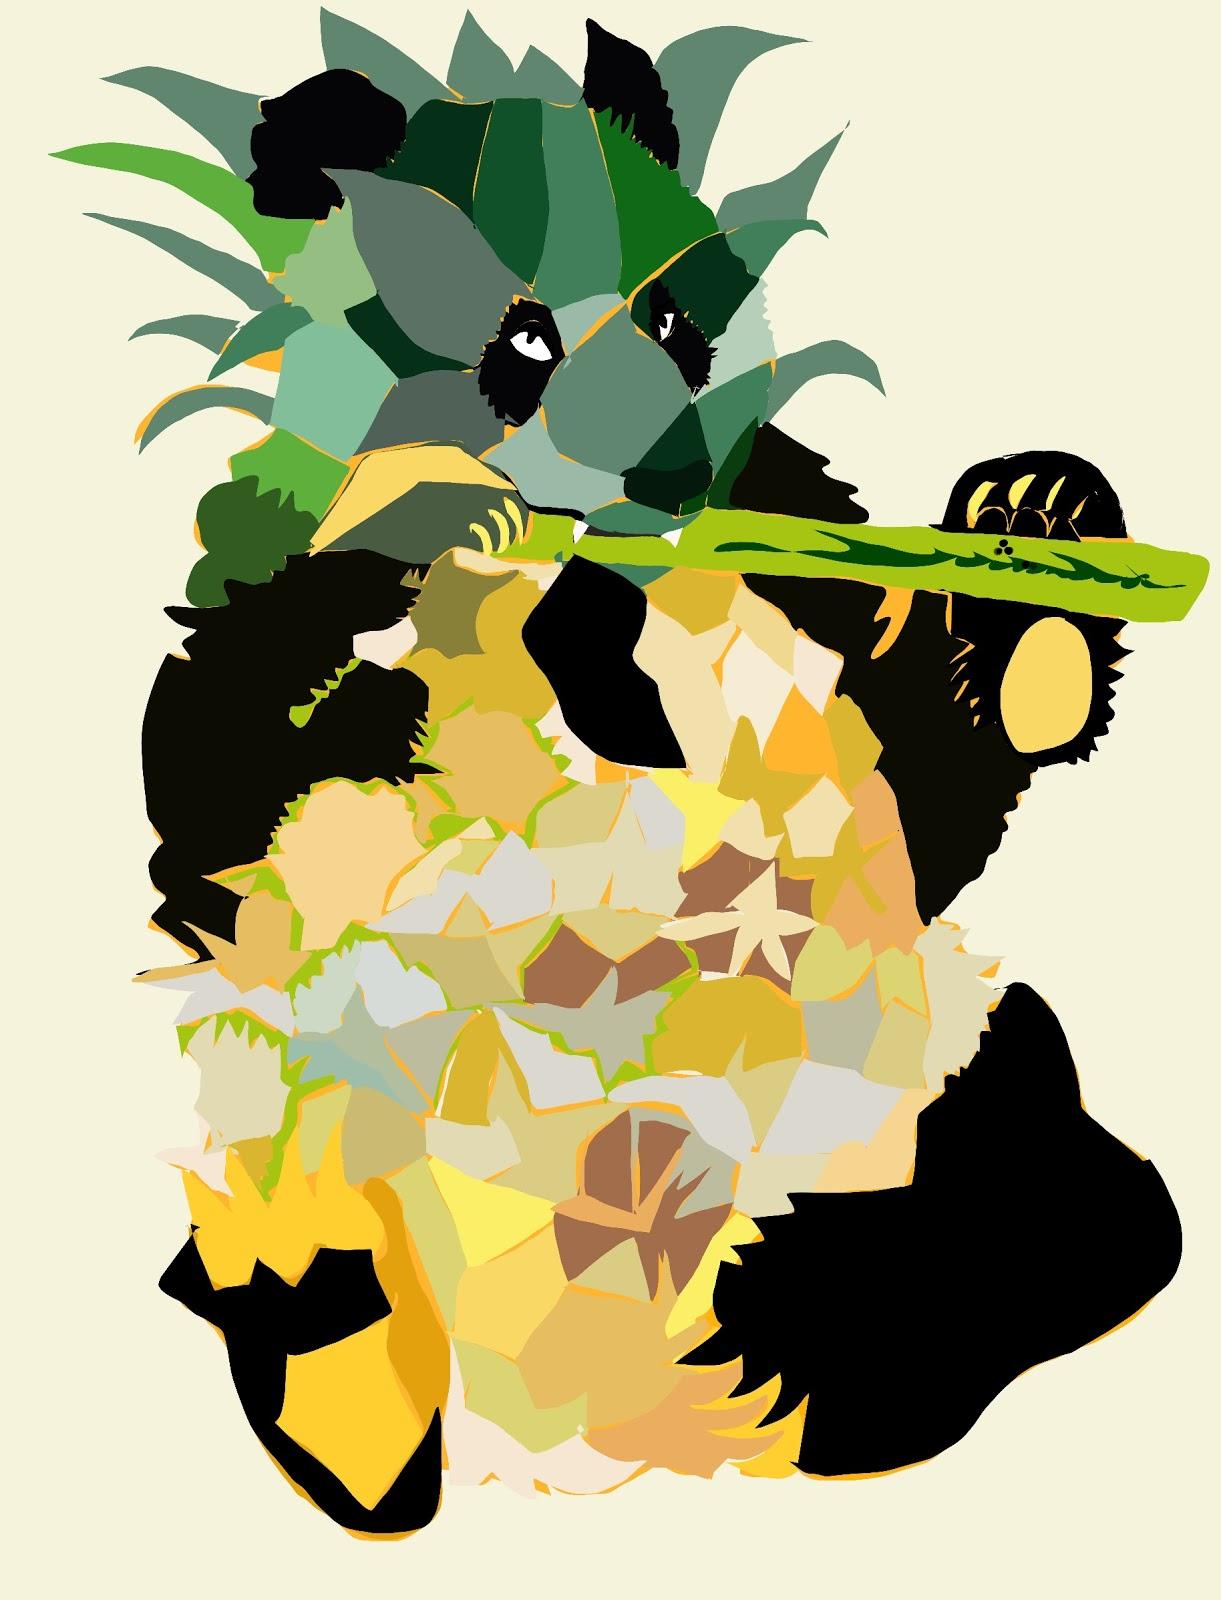 Panda and Pineapple chromosplice design